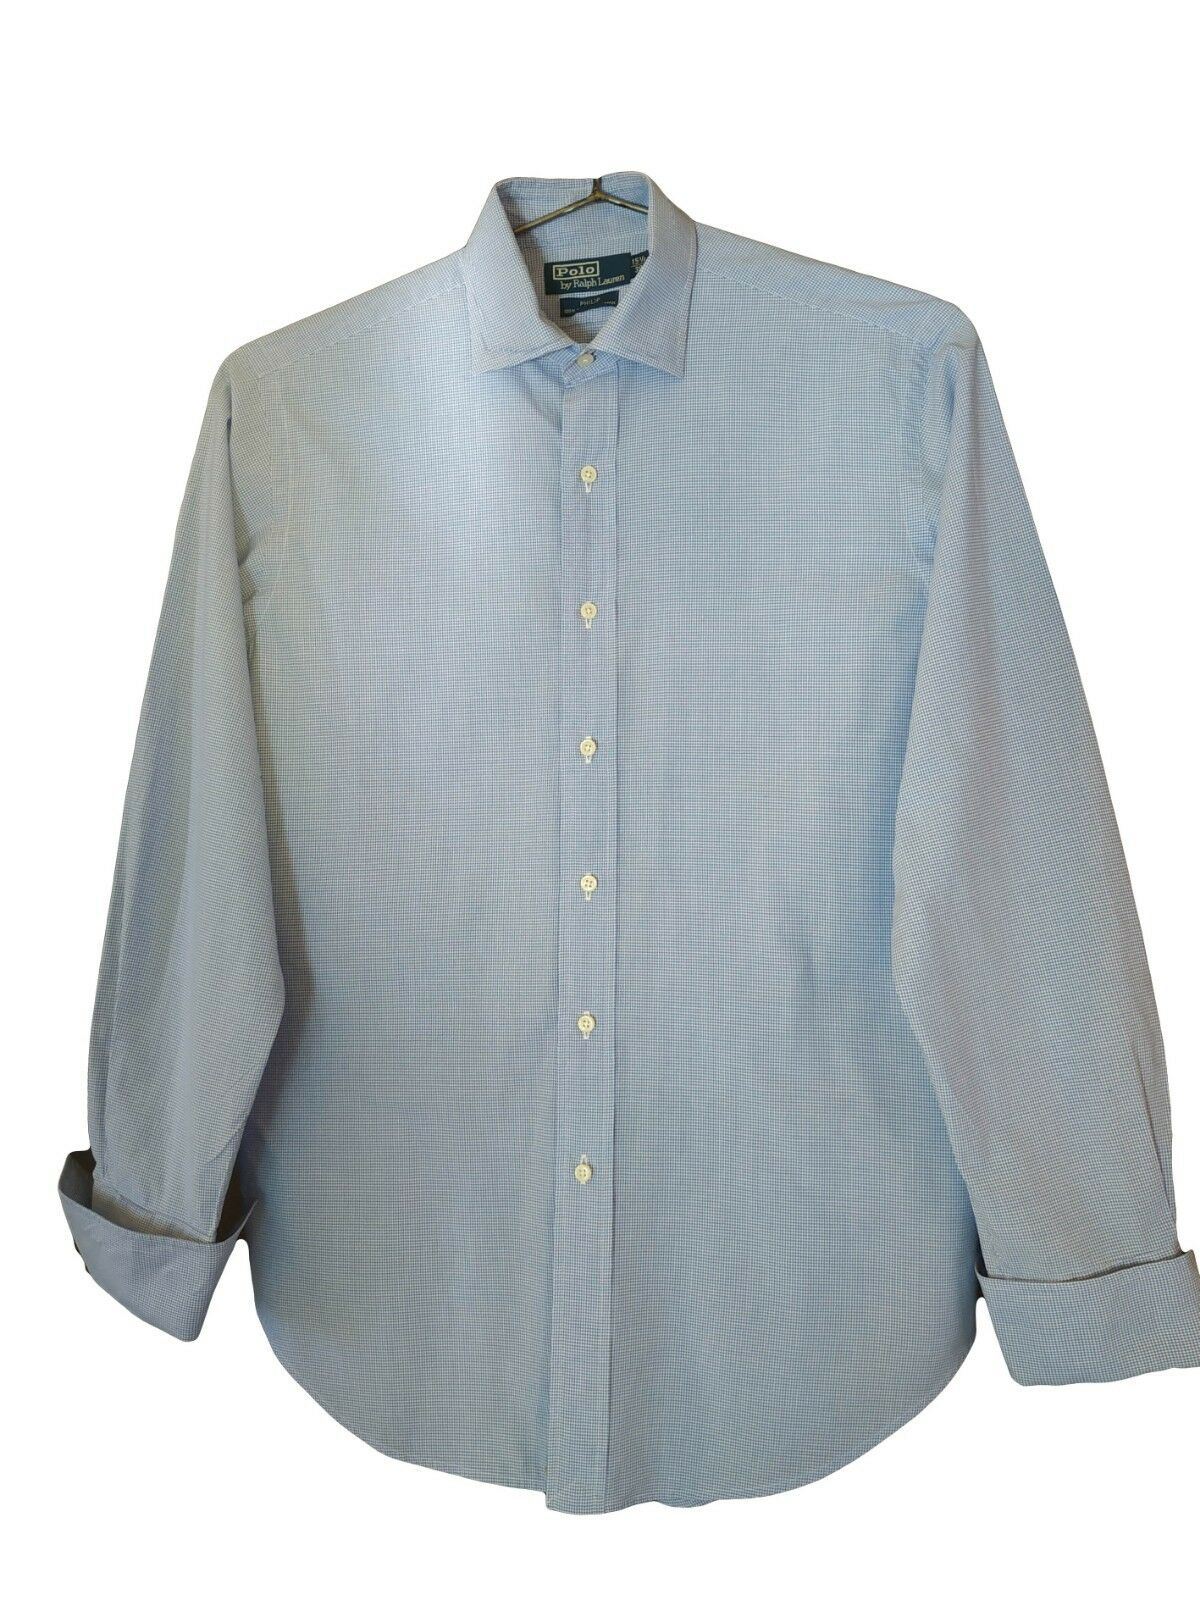 Genuine POLO by RALPH LAUREN Men's bluee Cotton Formal Shirt size 15.5